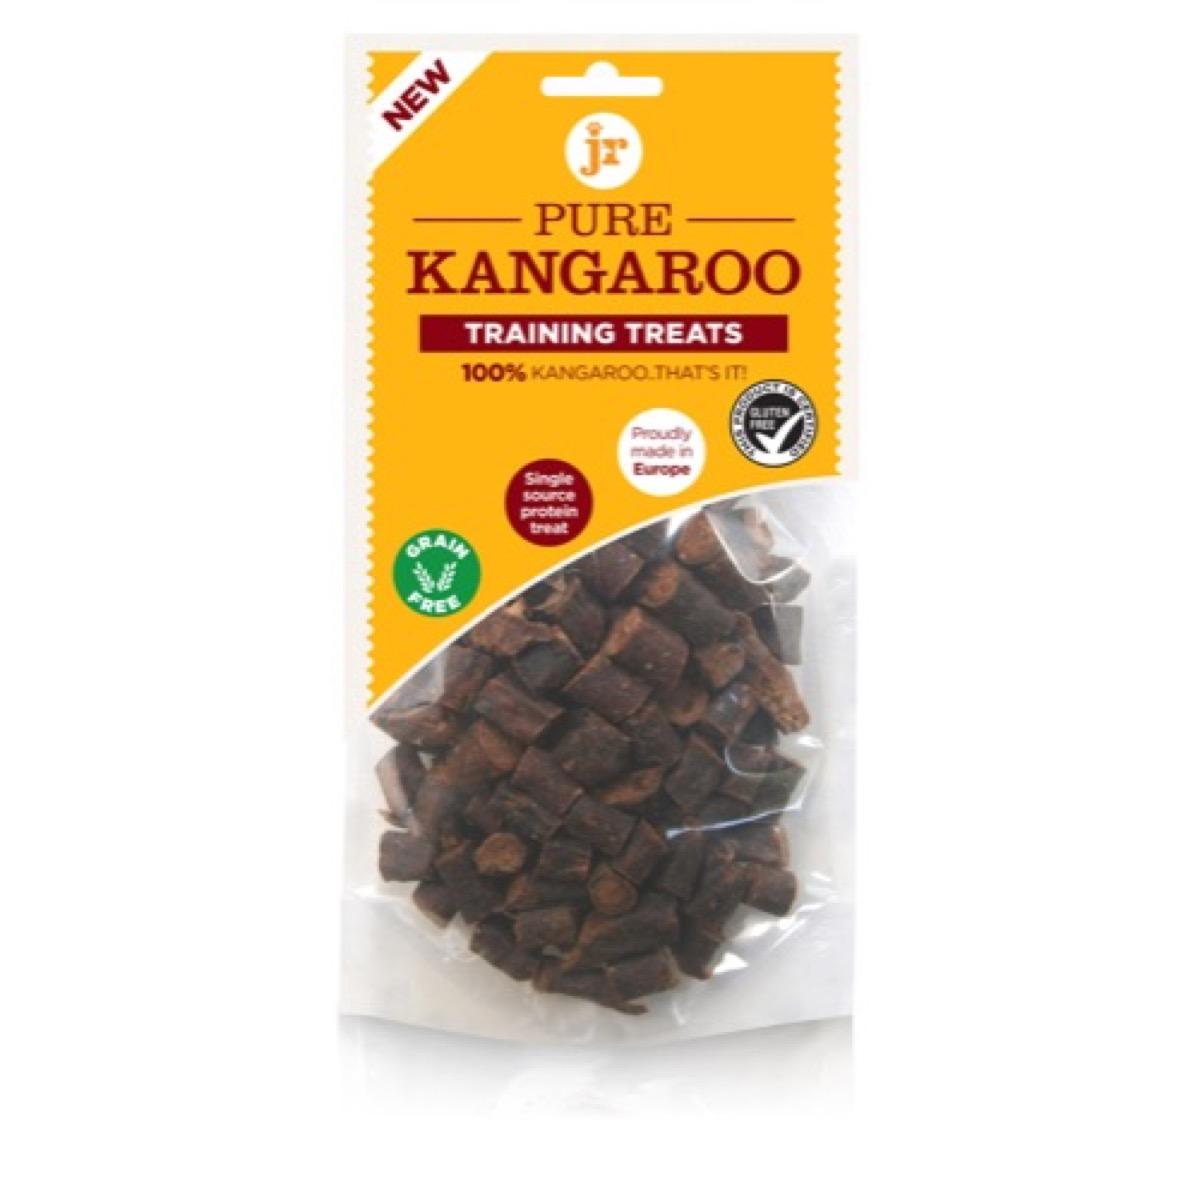 JR Pet Products Pure Kangaroo Training Treats 85g